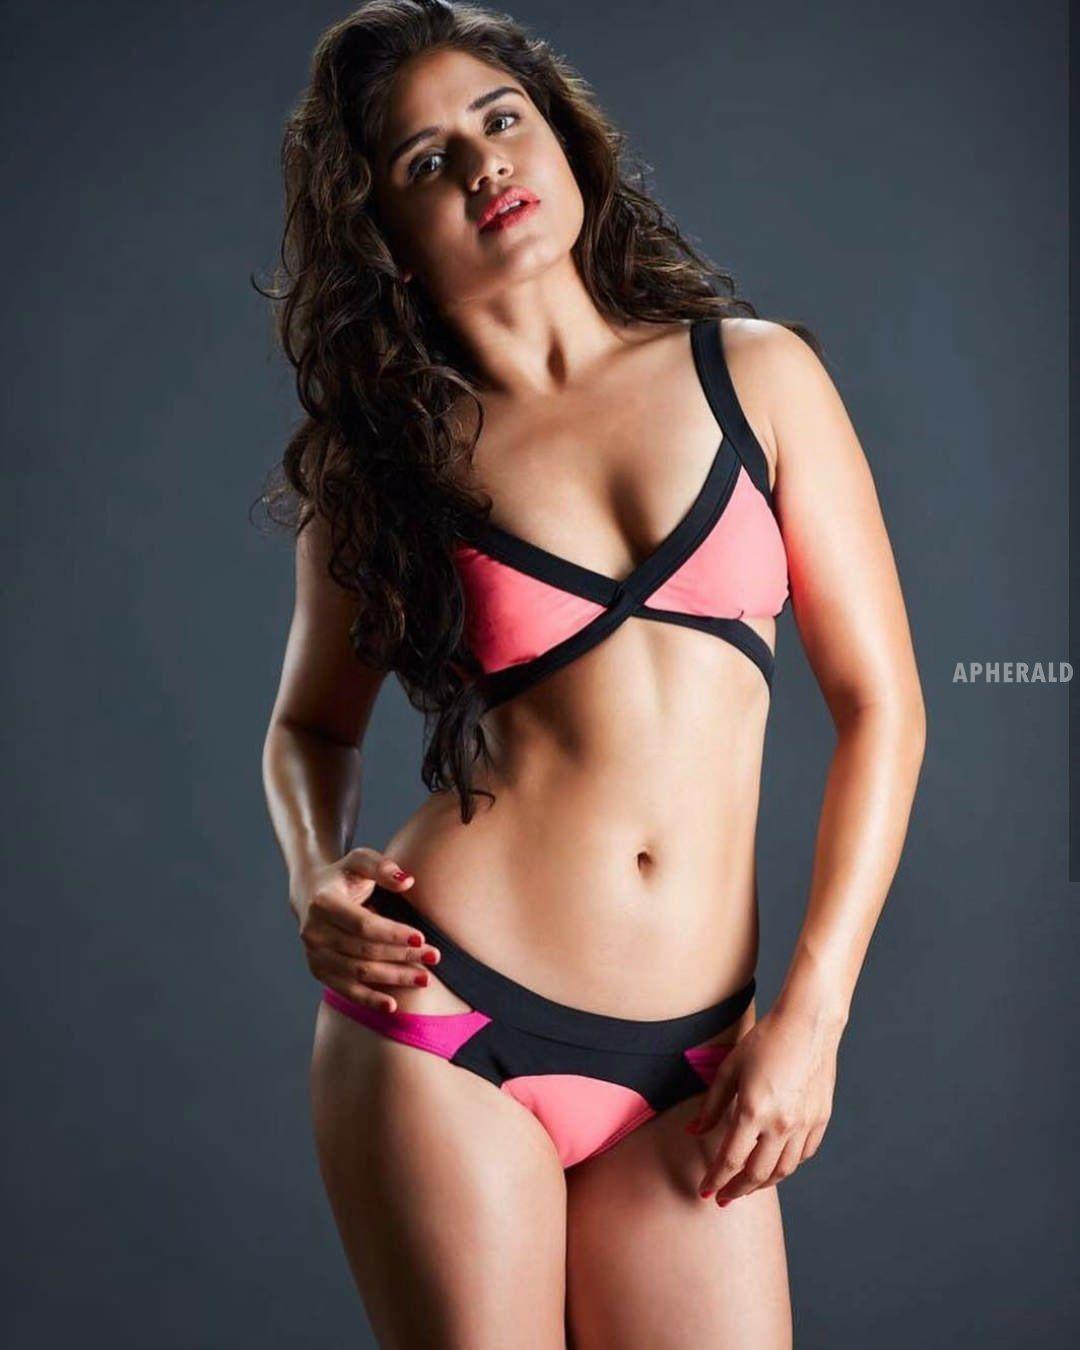 18 Hot Bikini Photos of Model Ranjana Mishra